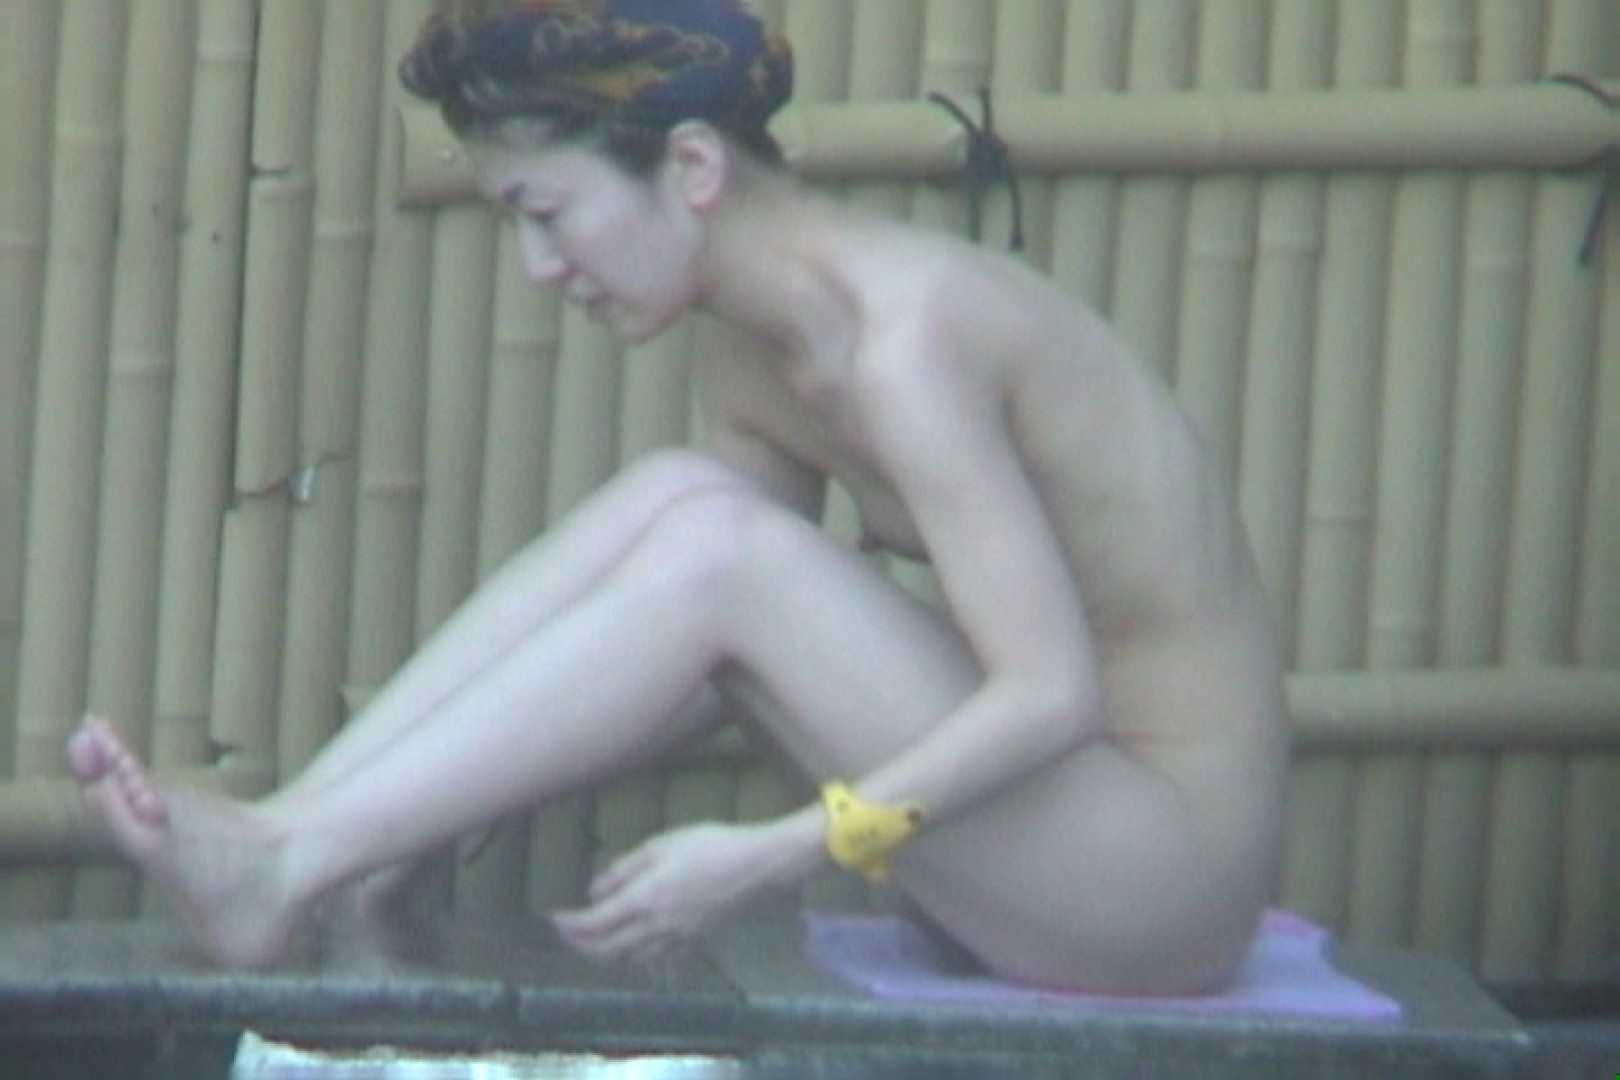 Aquaな露天風呂Vol.607 綺麗なOLたち アダルト動画キャプチャ 90枚 41